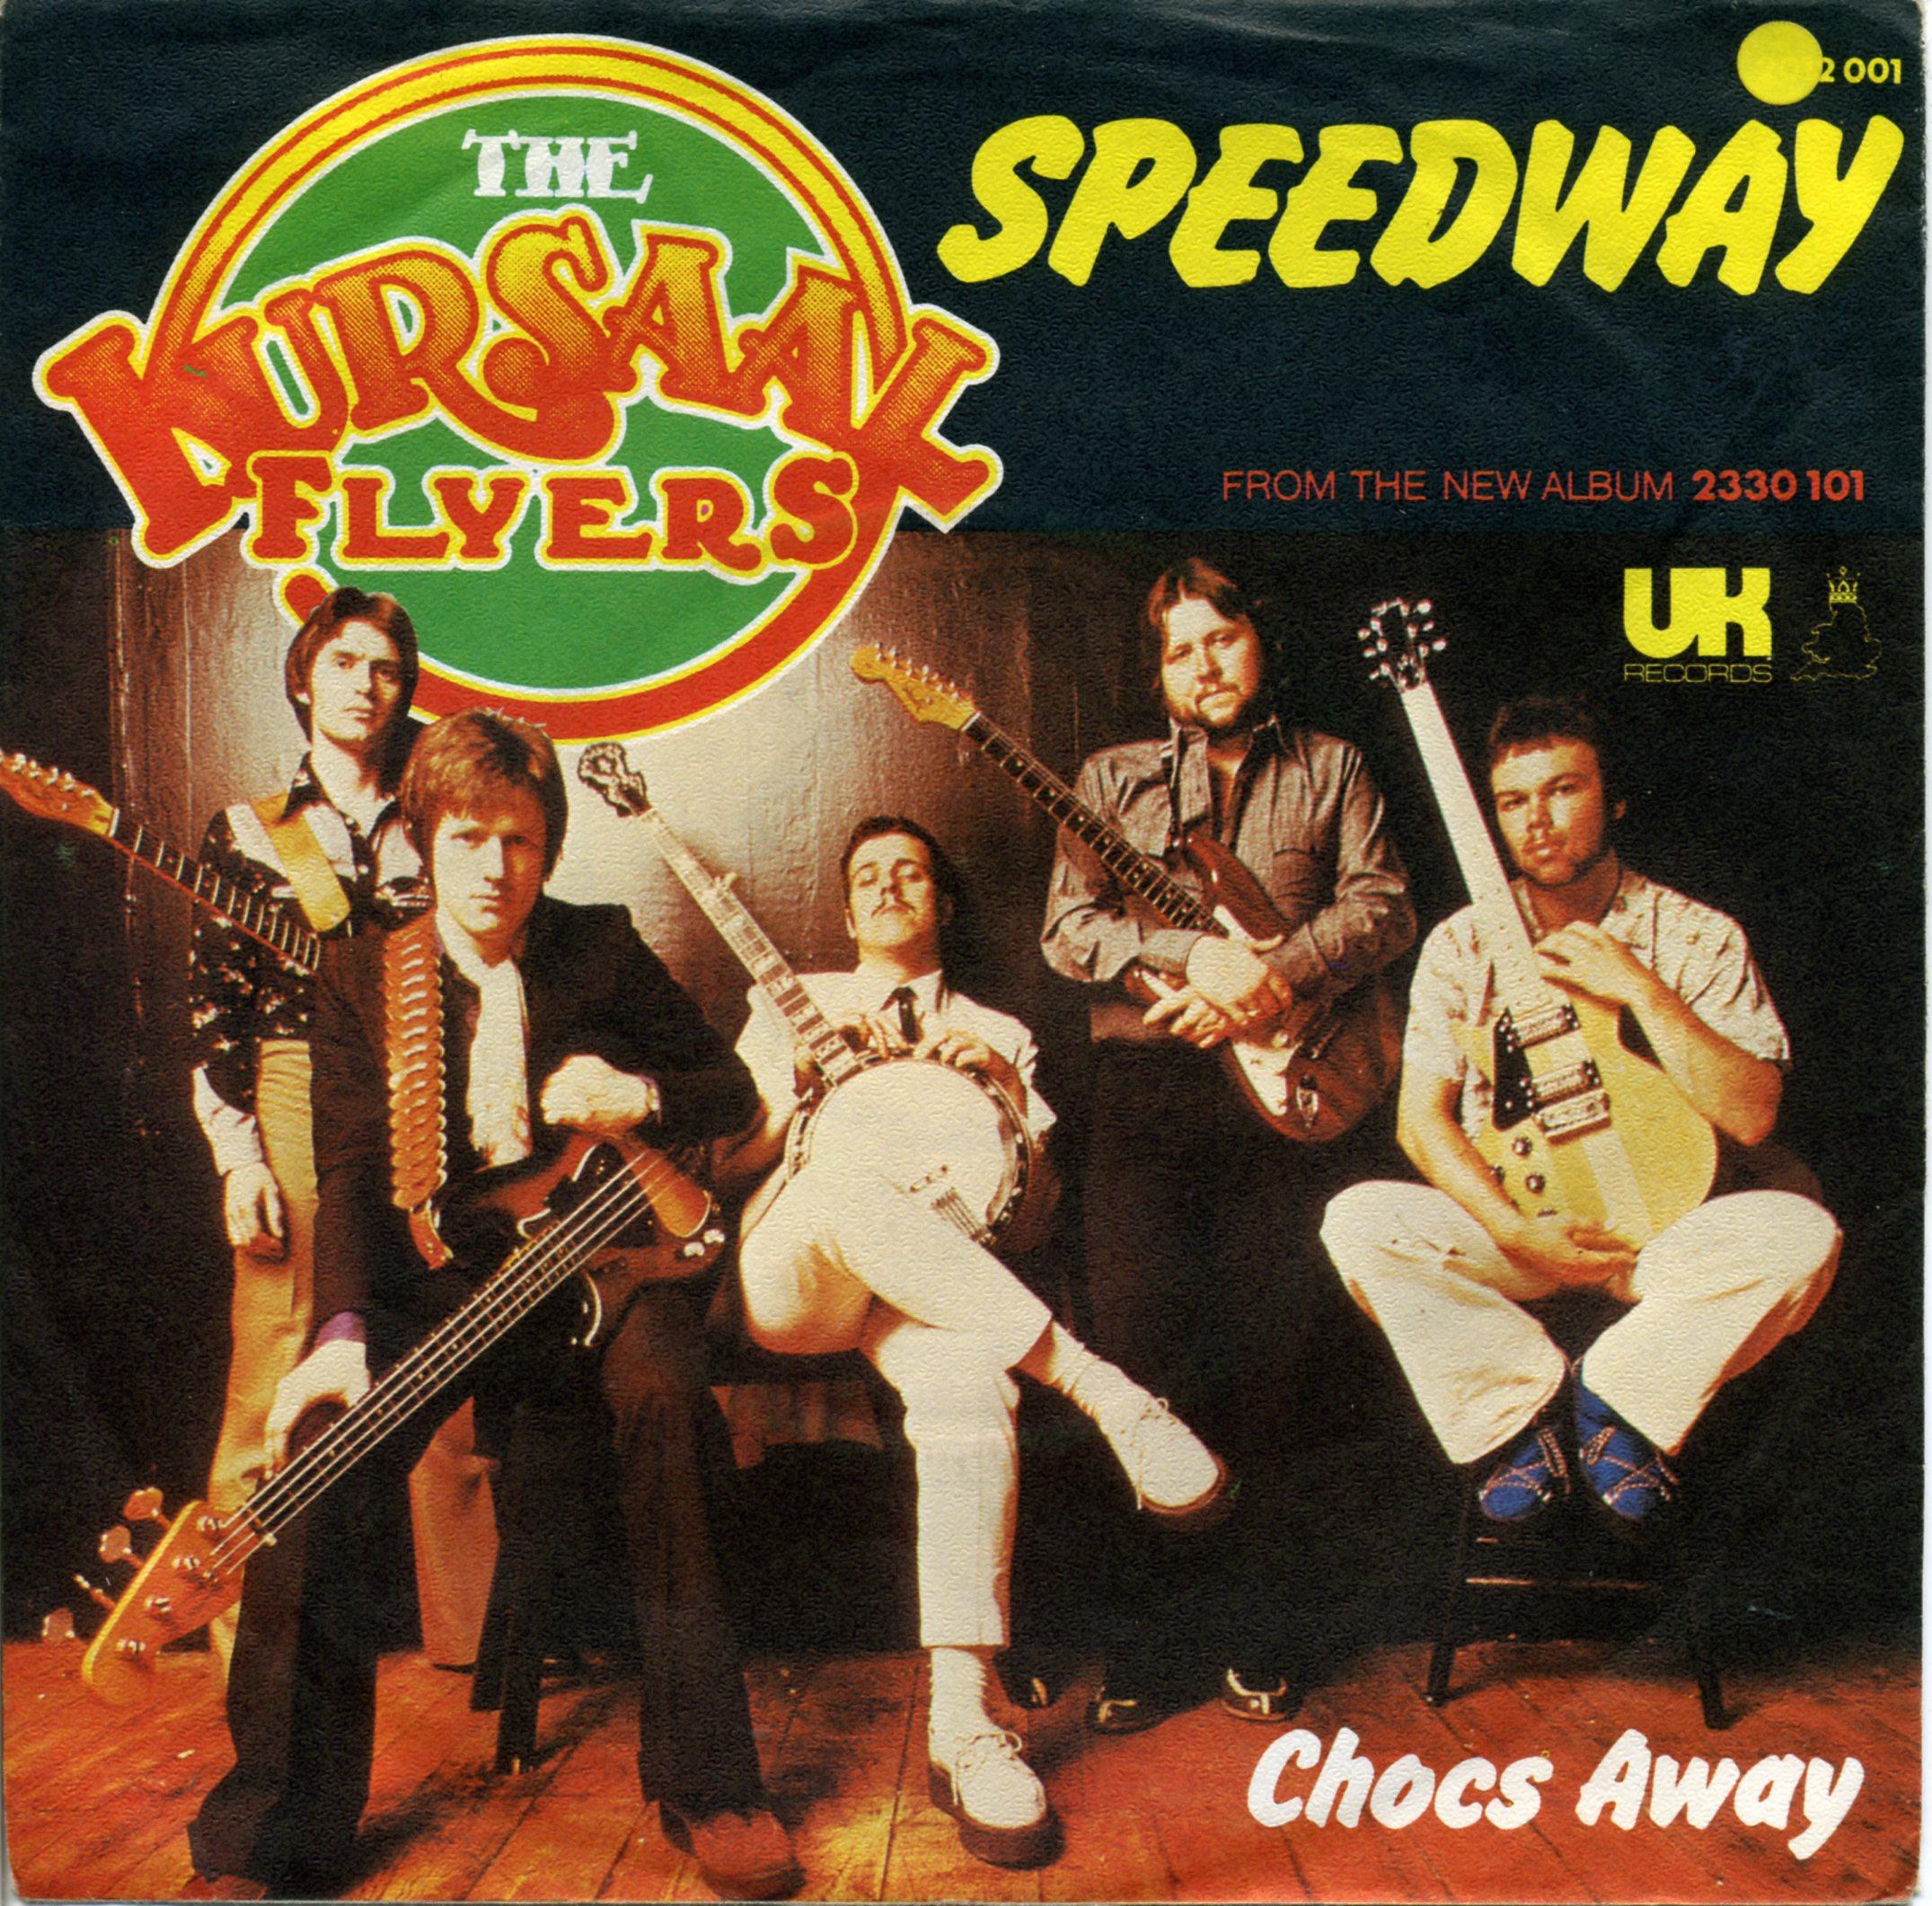 The Kursaal Flyers: Speedway